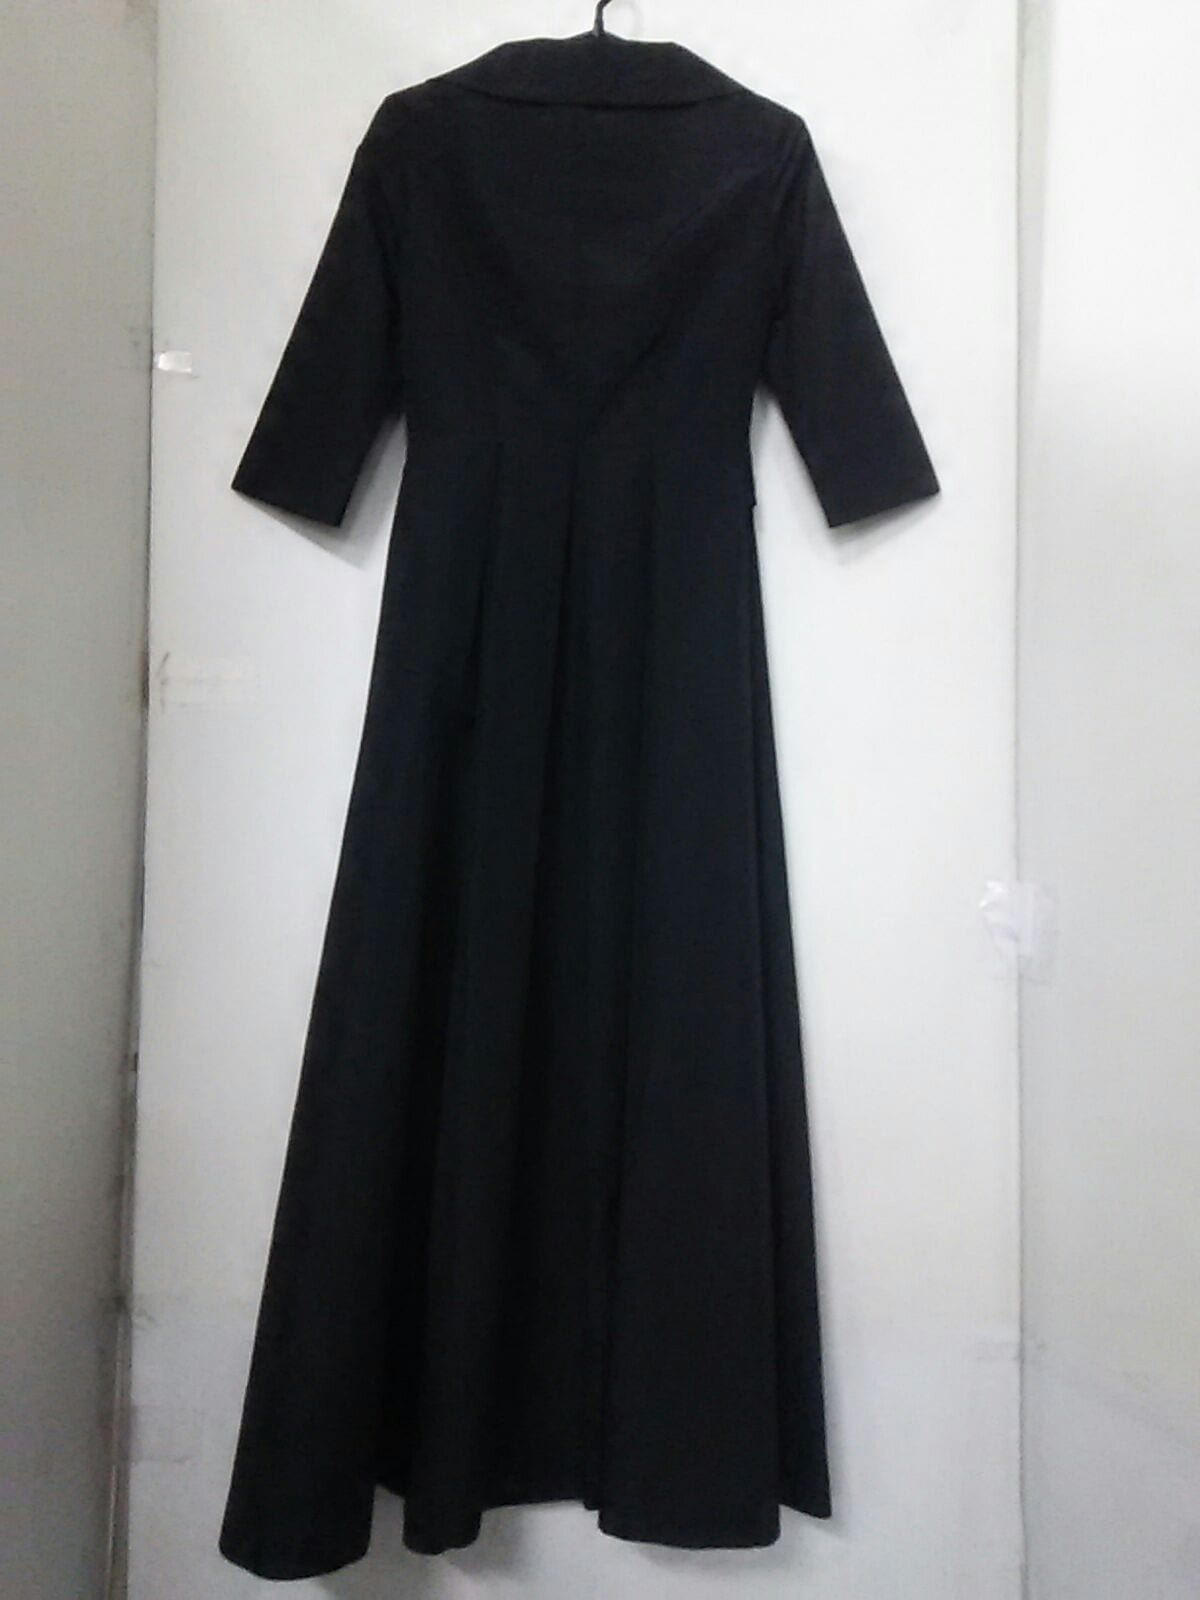 Sybilla(シビラ)のドレス